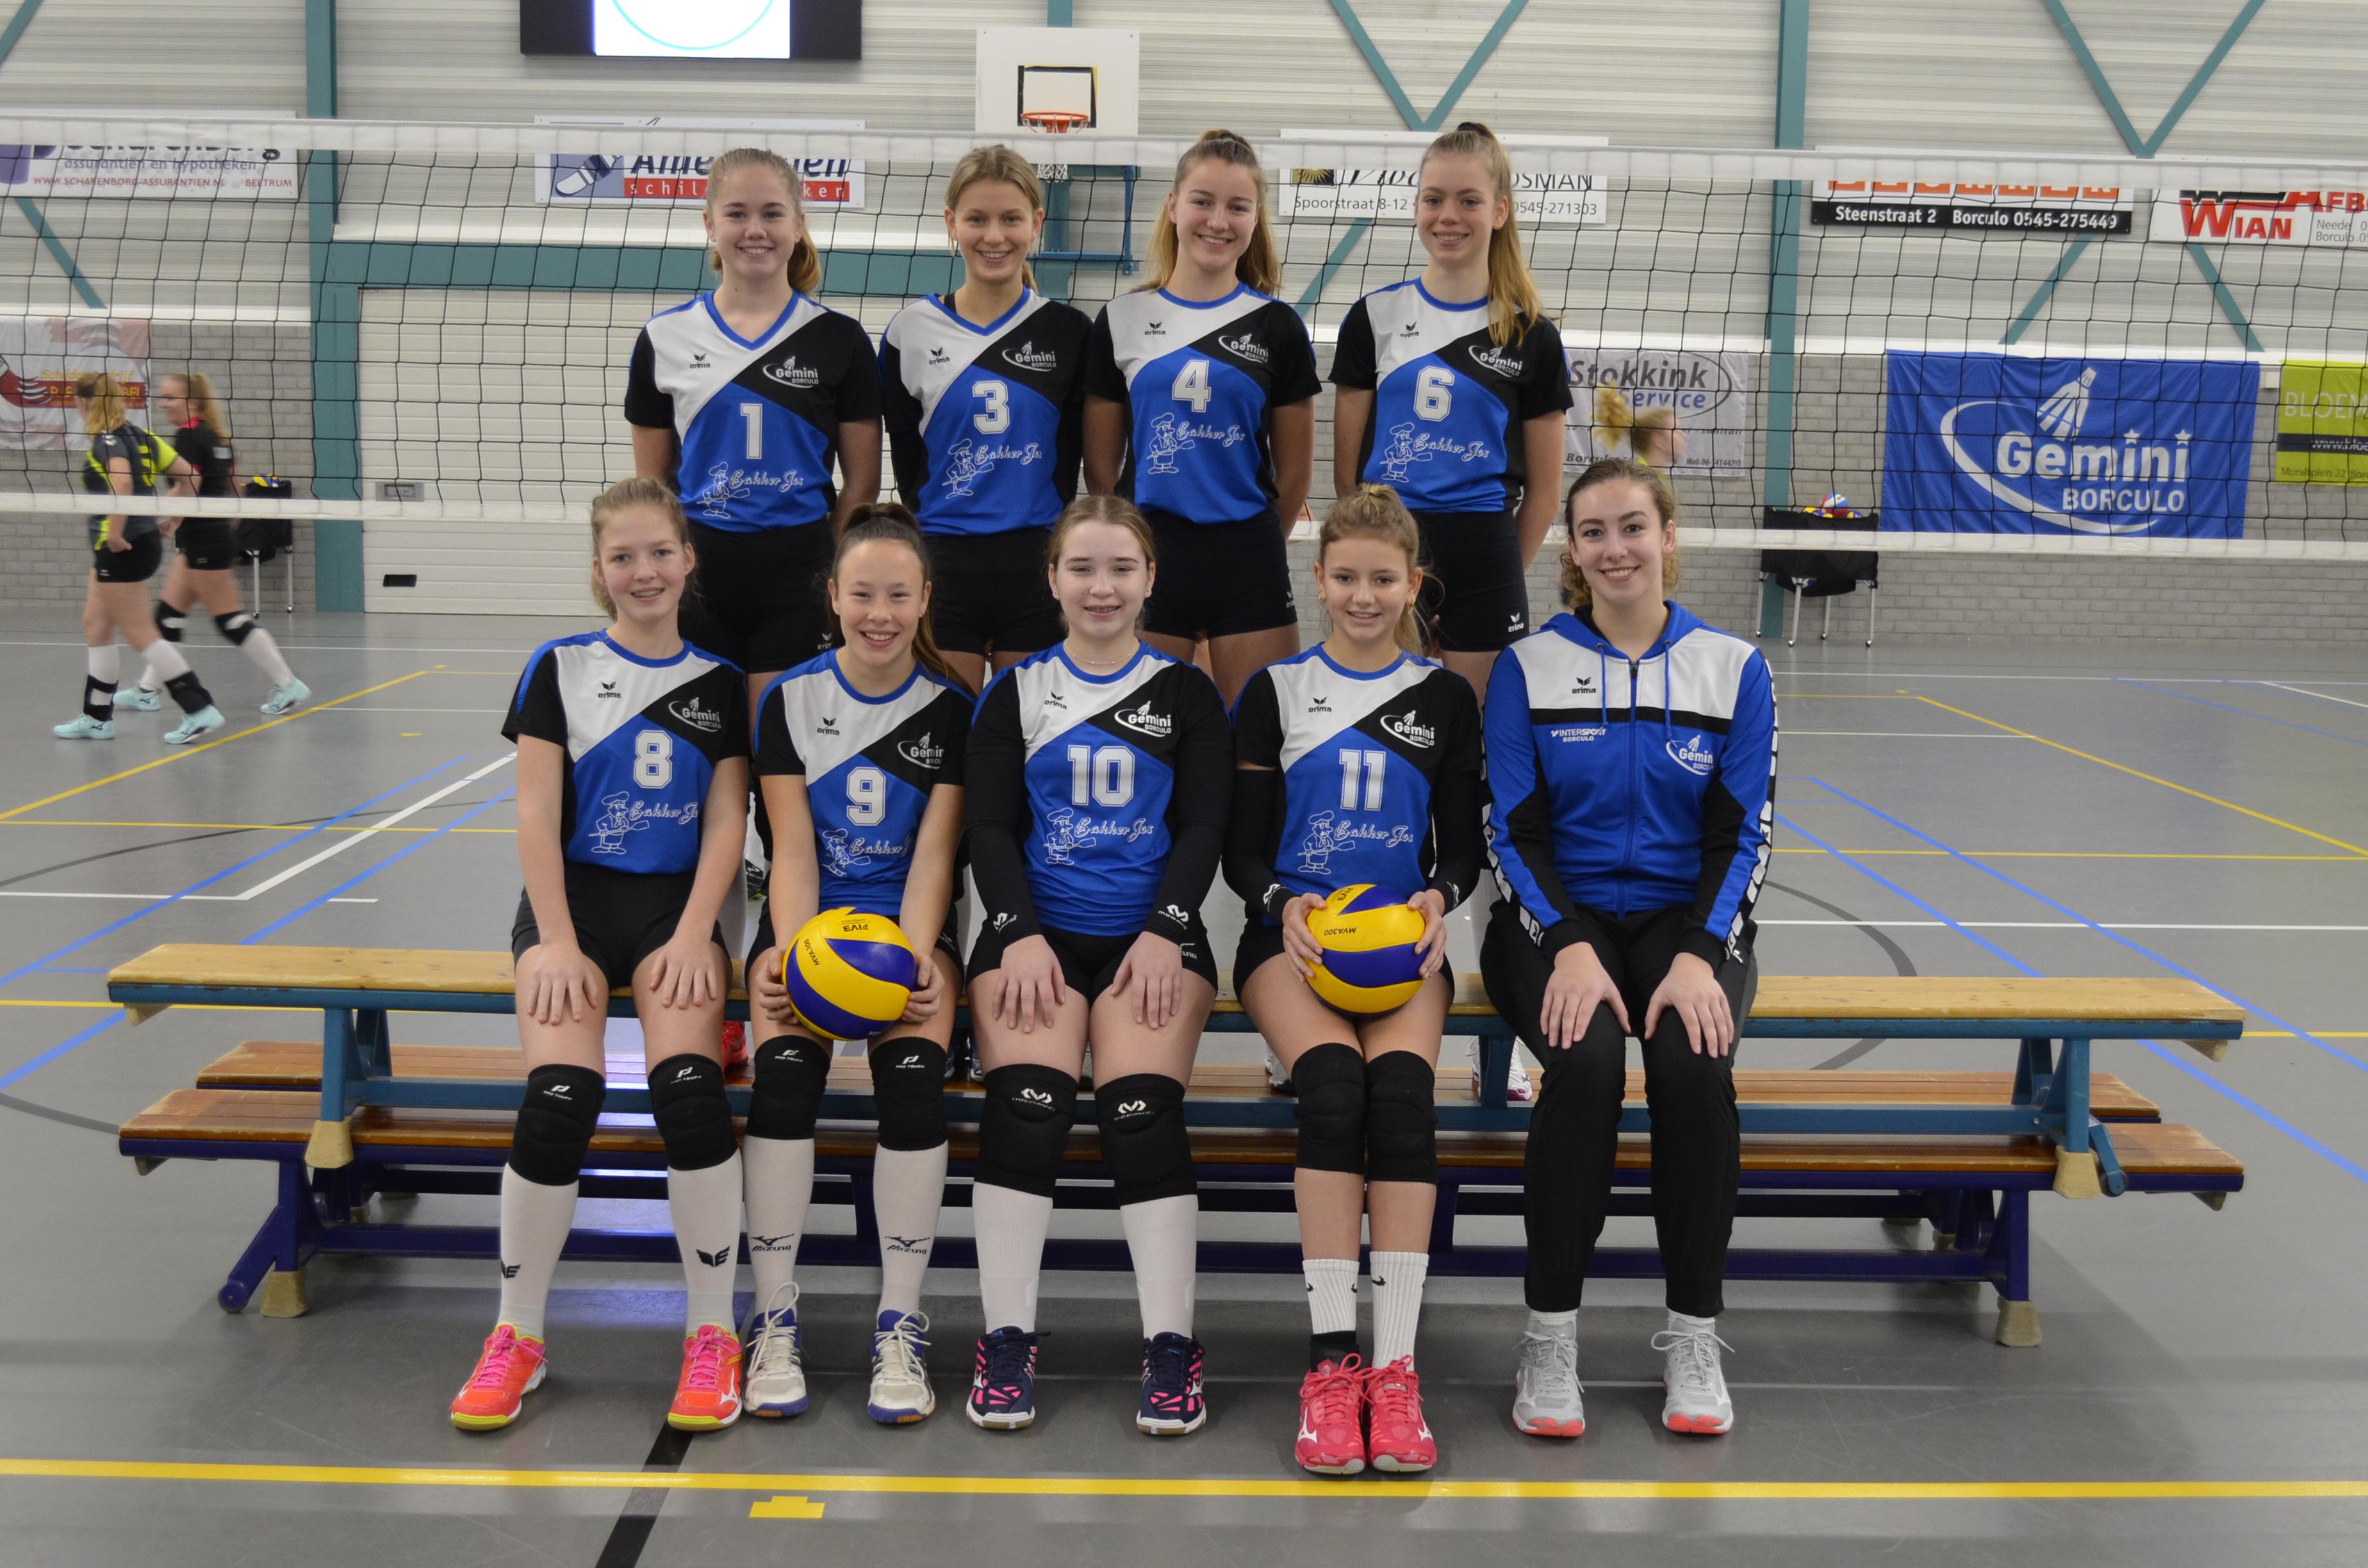 Gemini Borculo - Team Meisjes B1